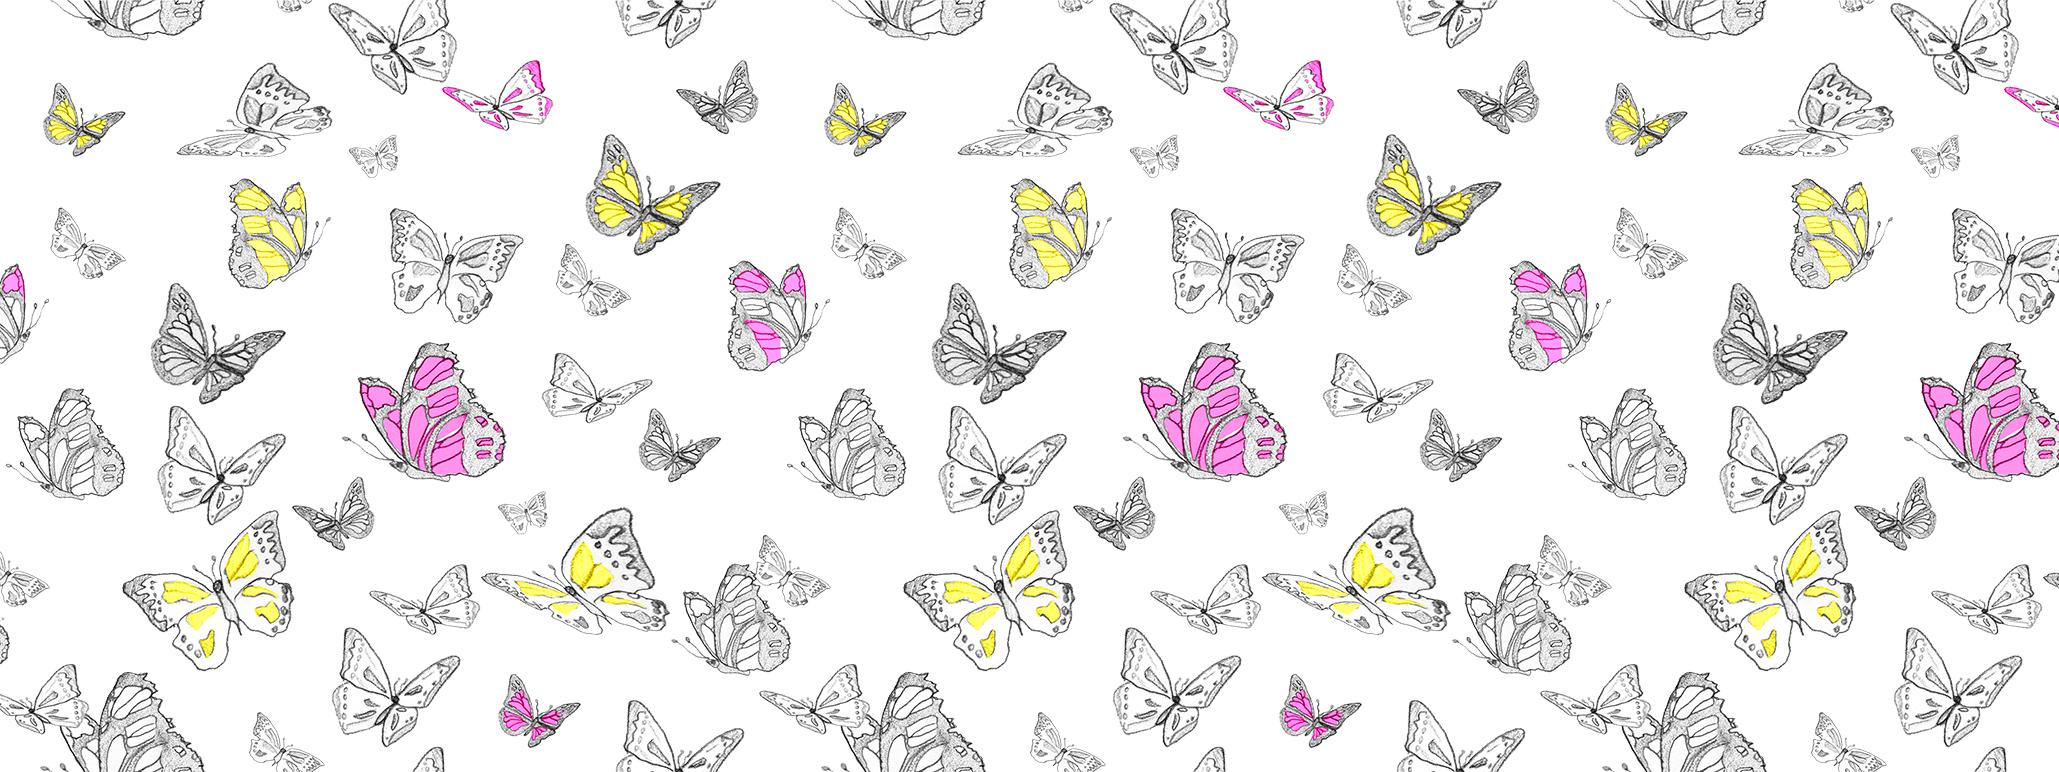 mariposaswebsite.jpg